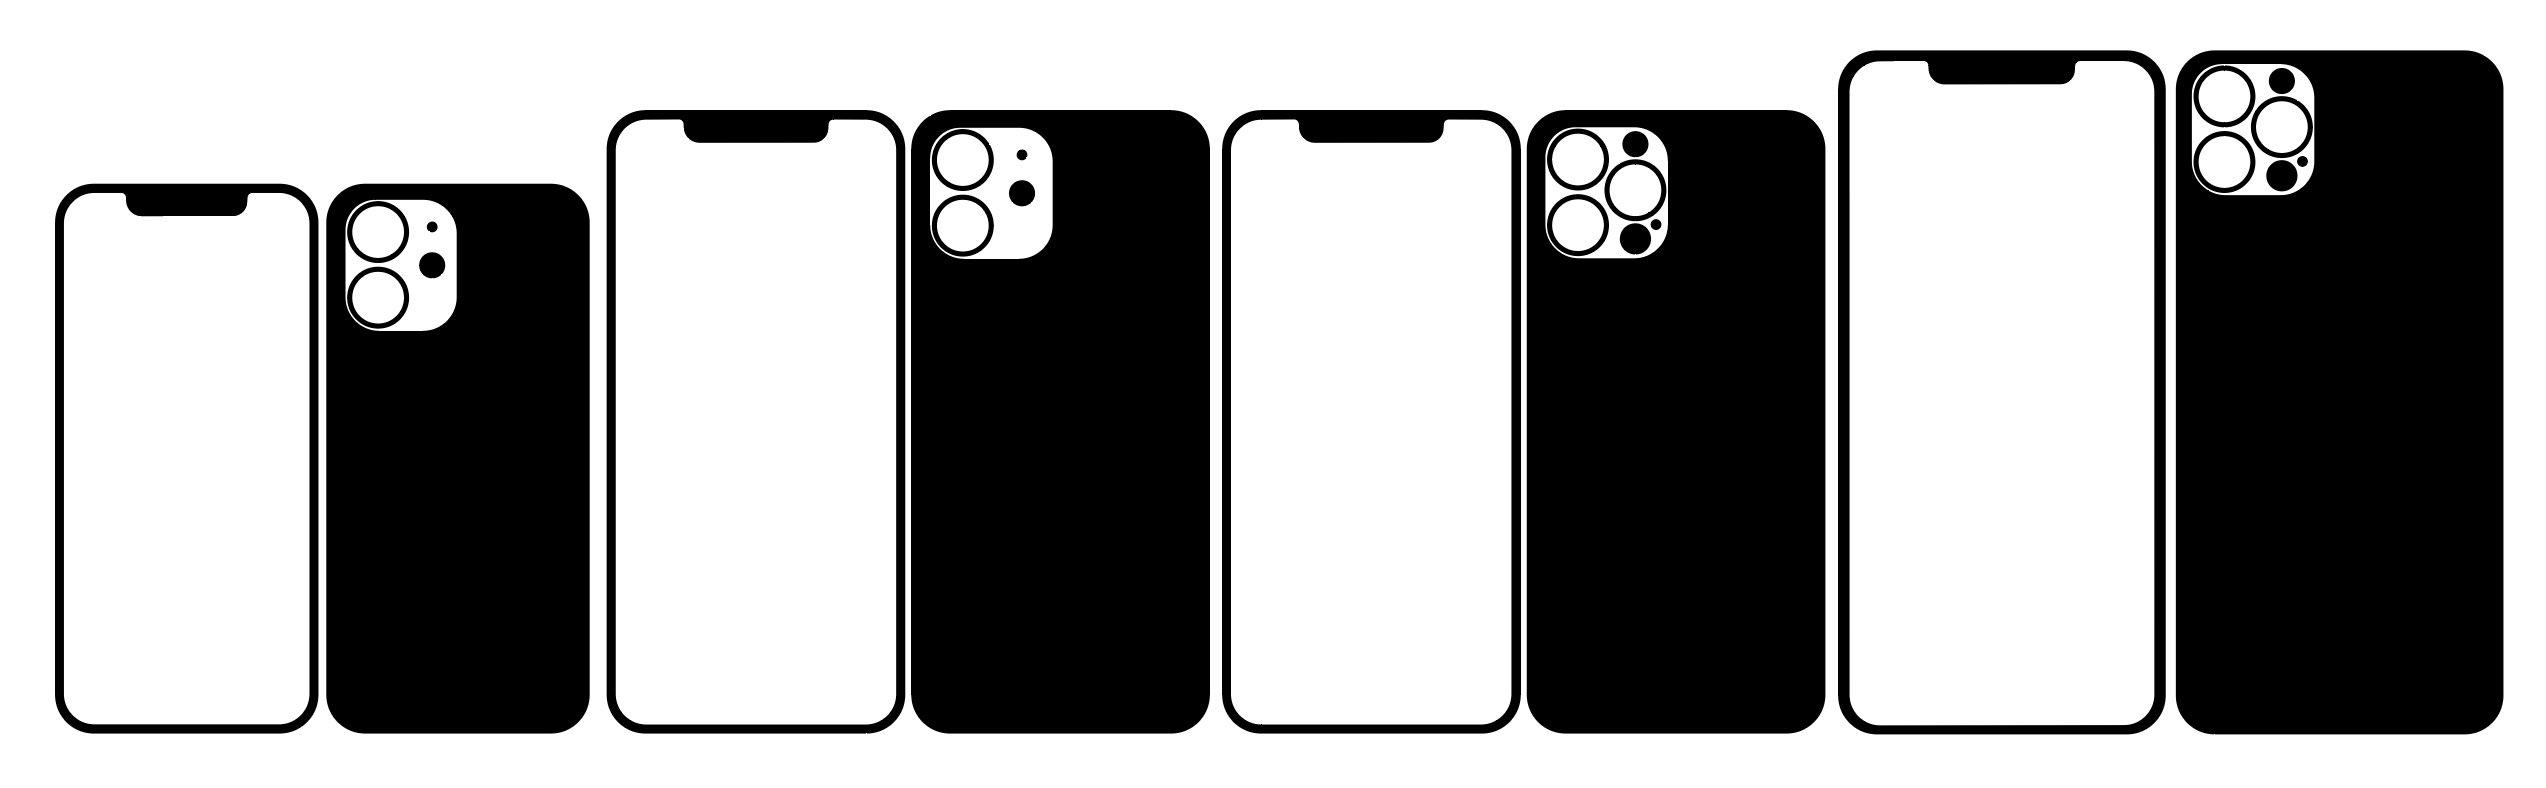 iPhone 12 лучшая новинка 2020 года